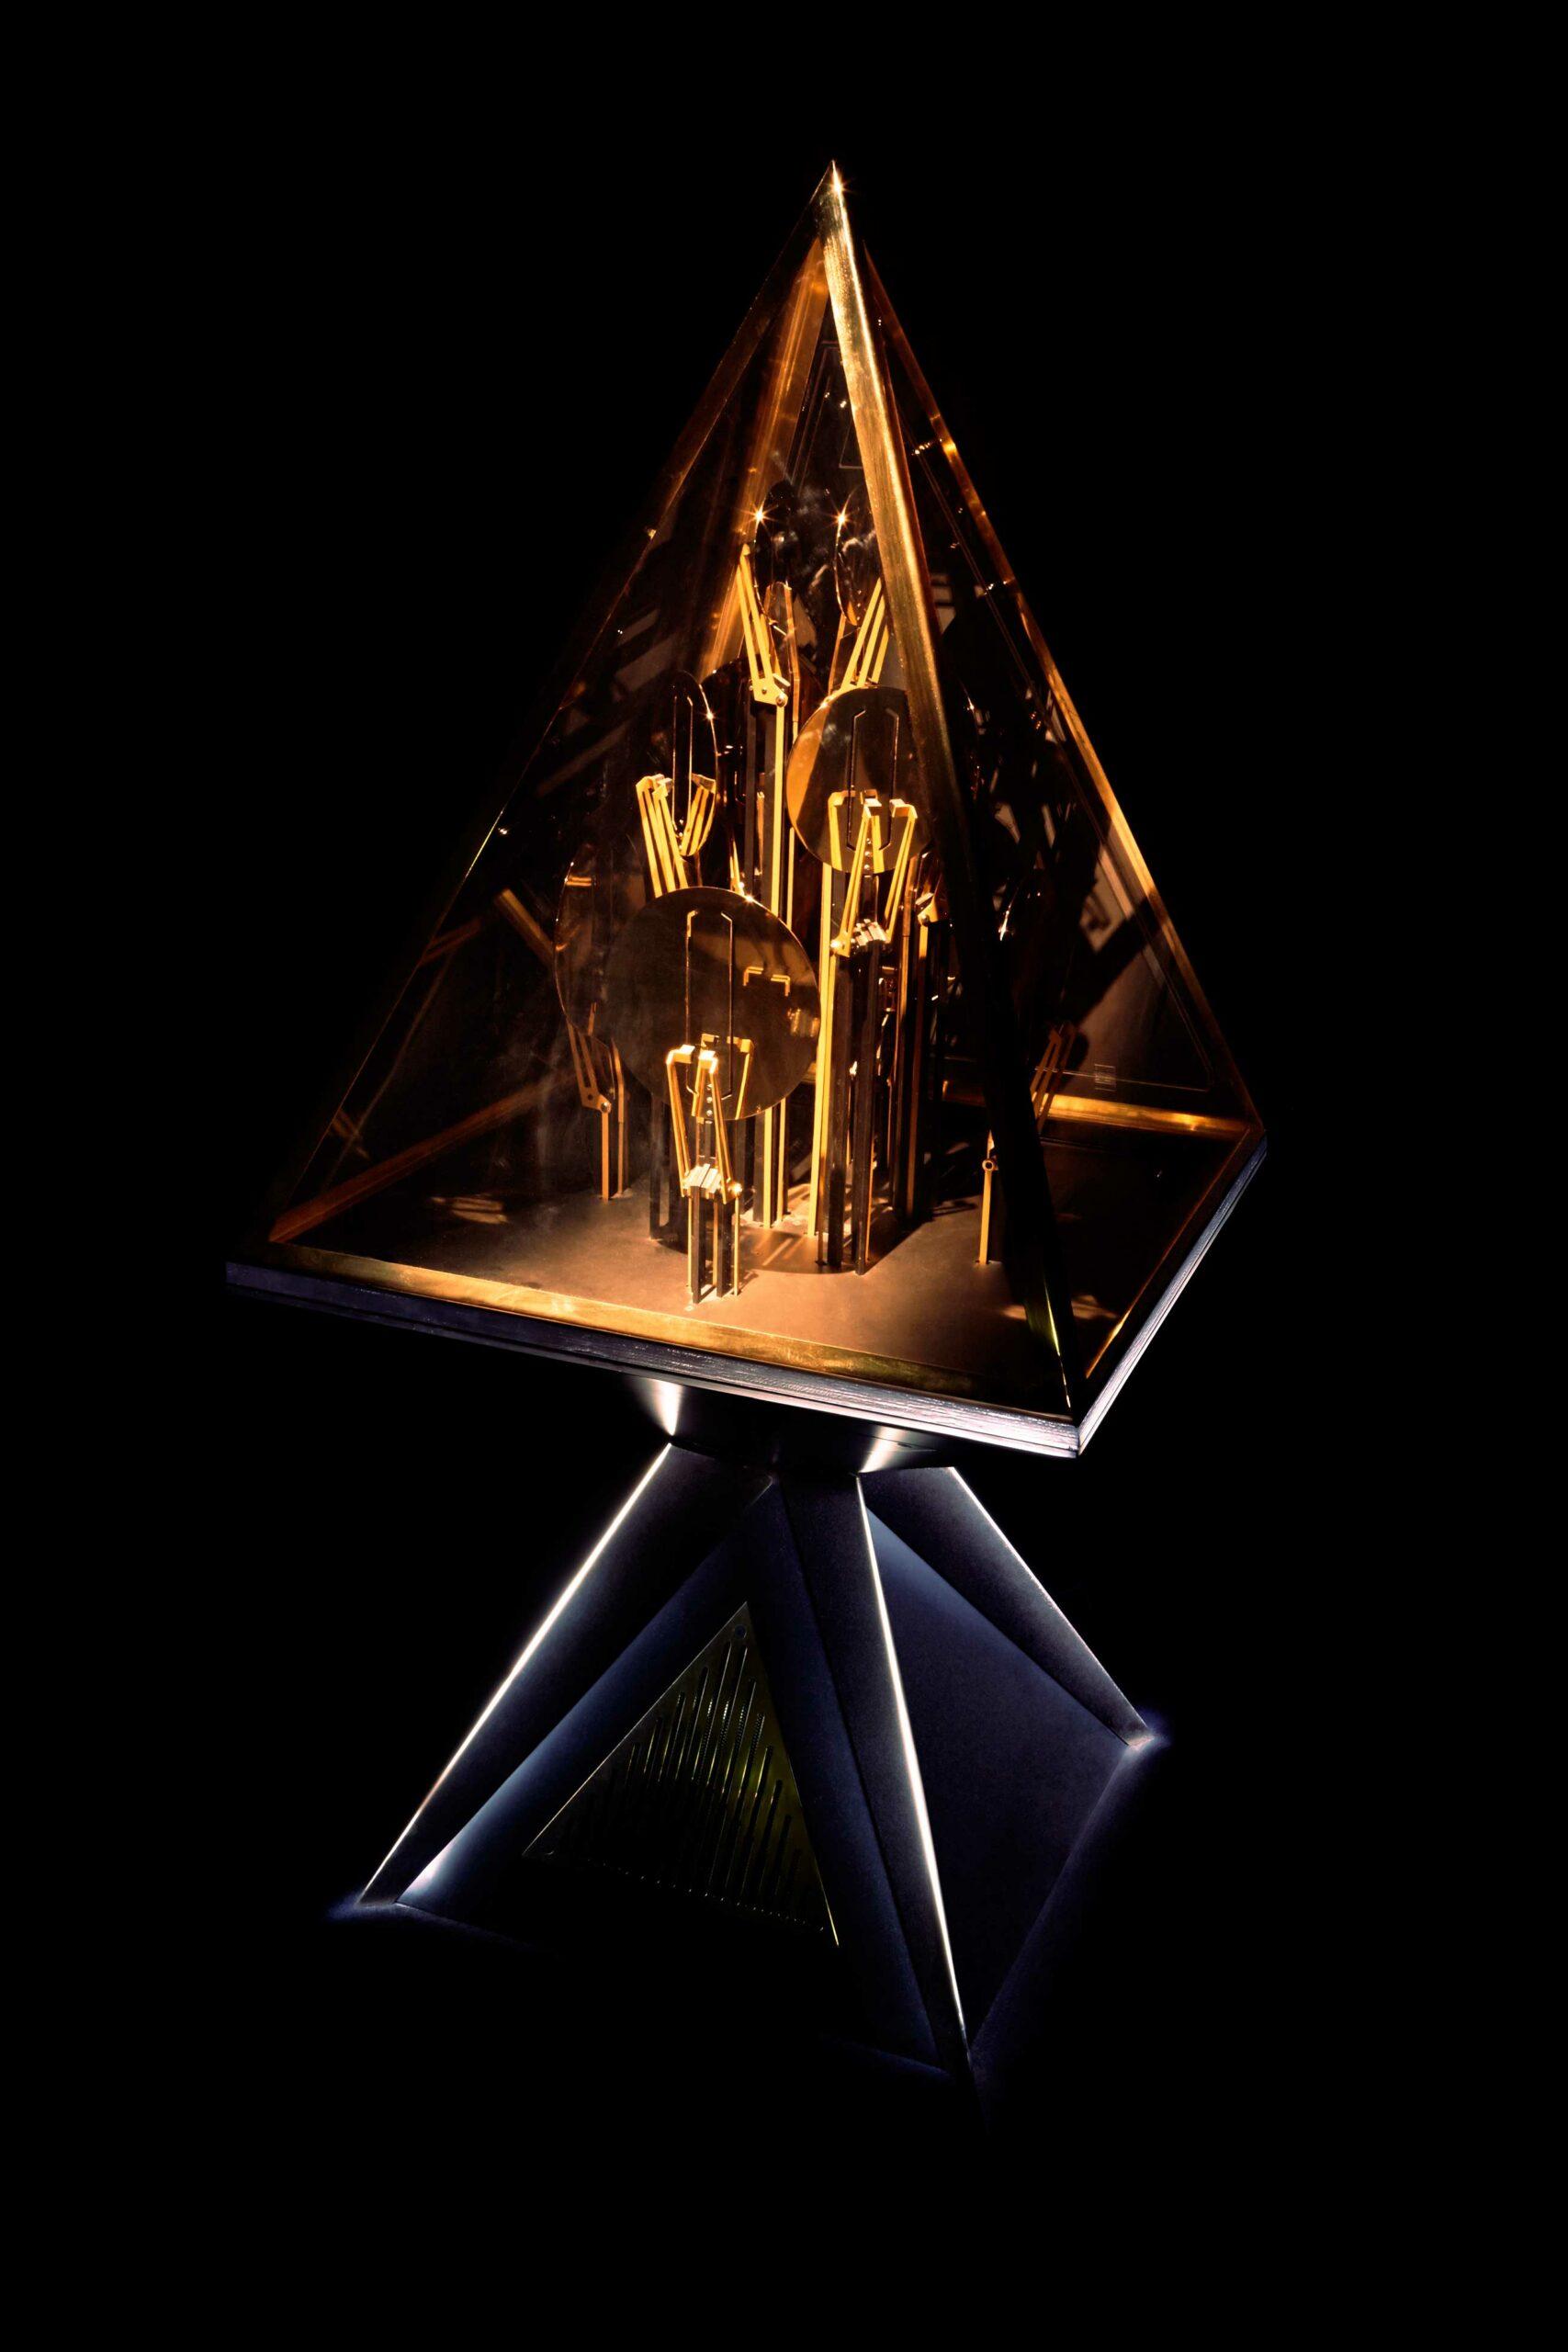 The Pyramidi